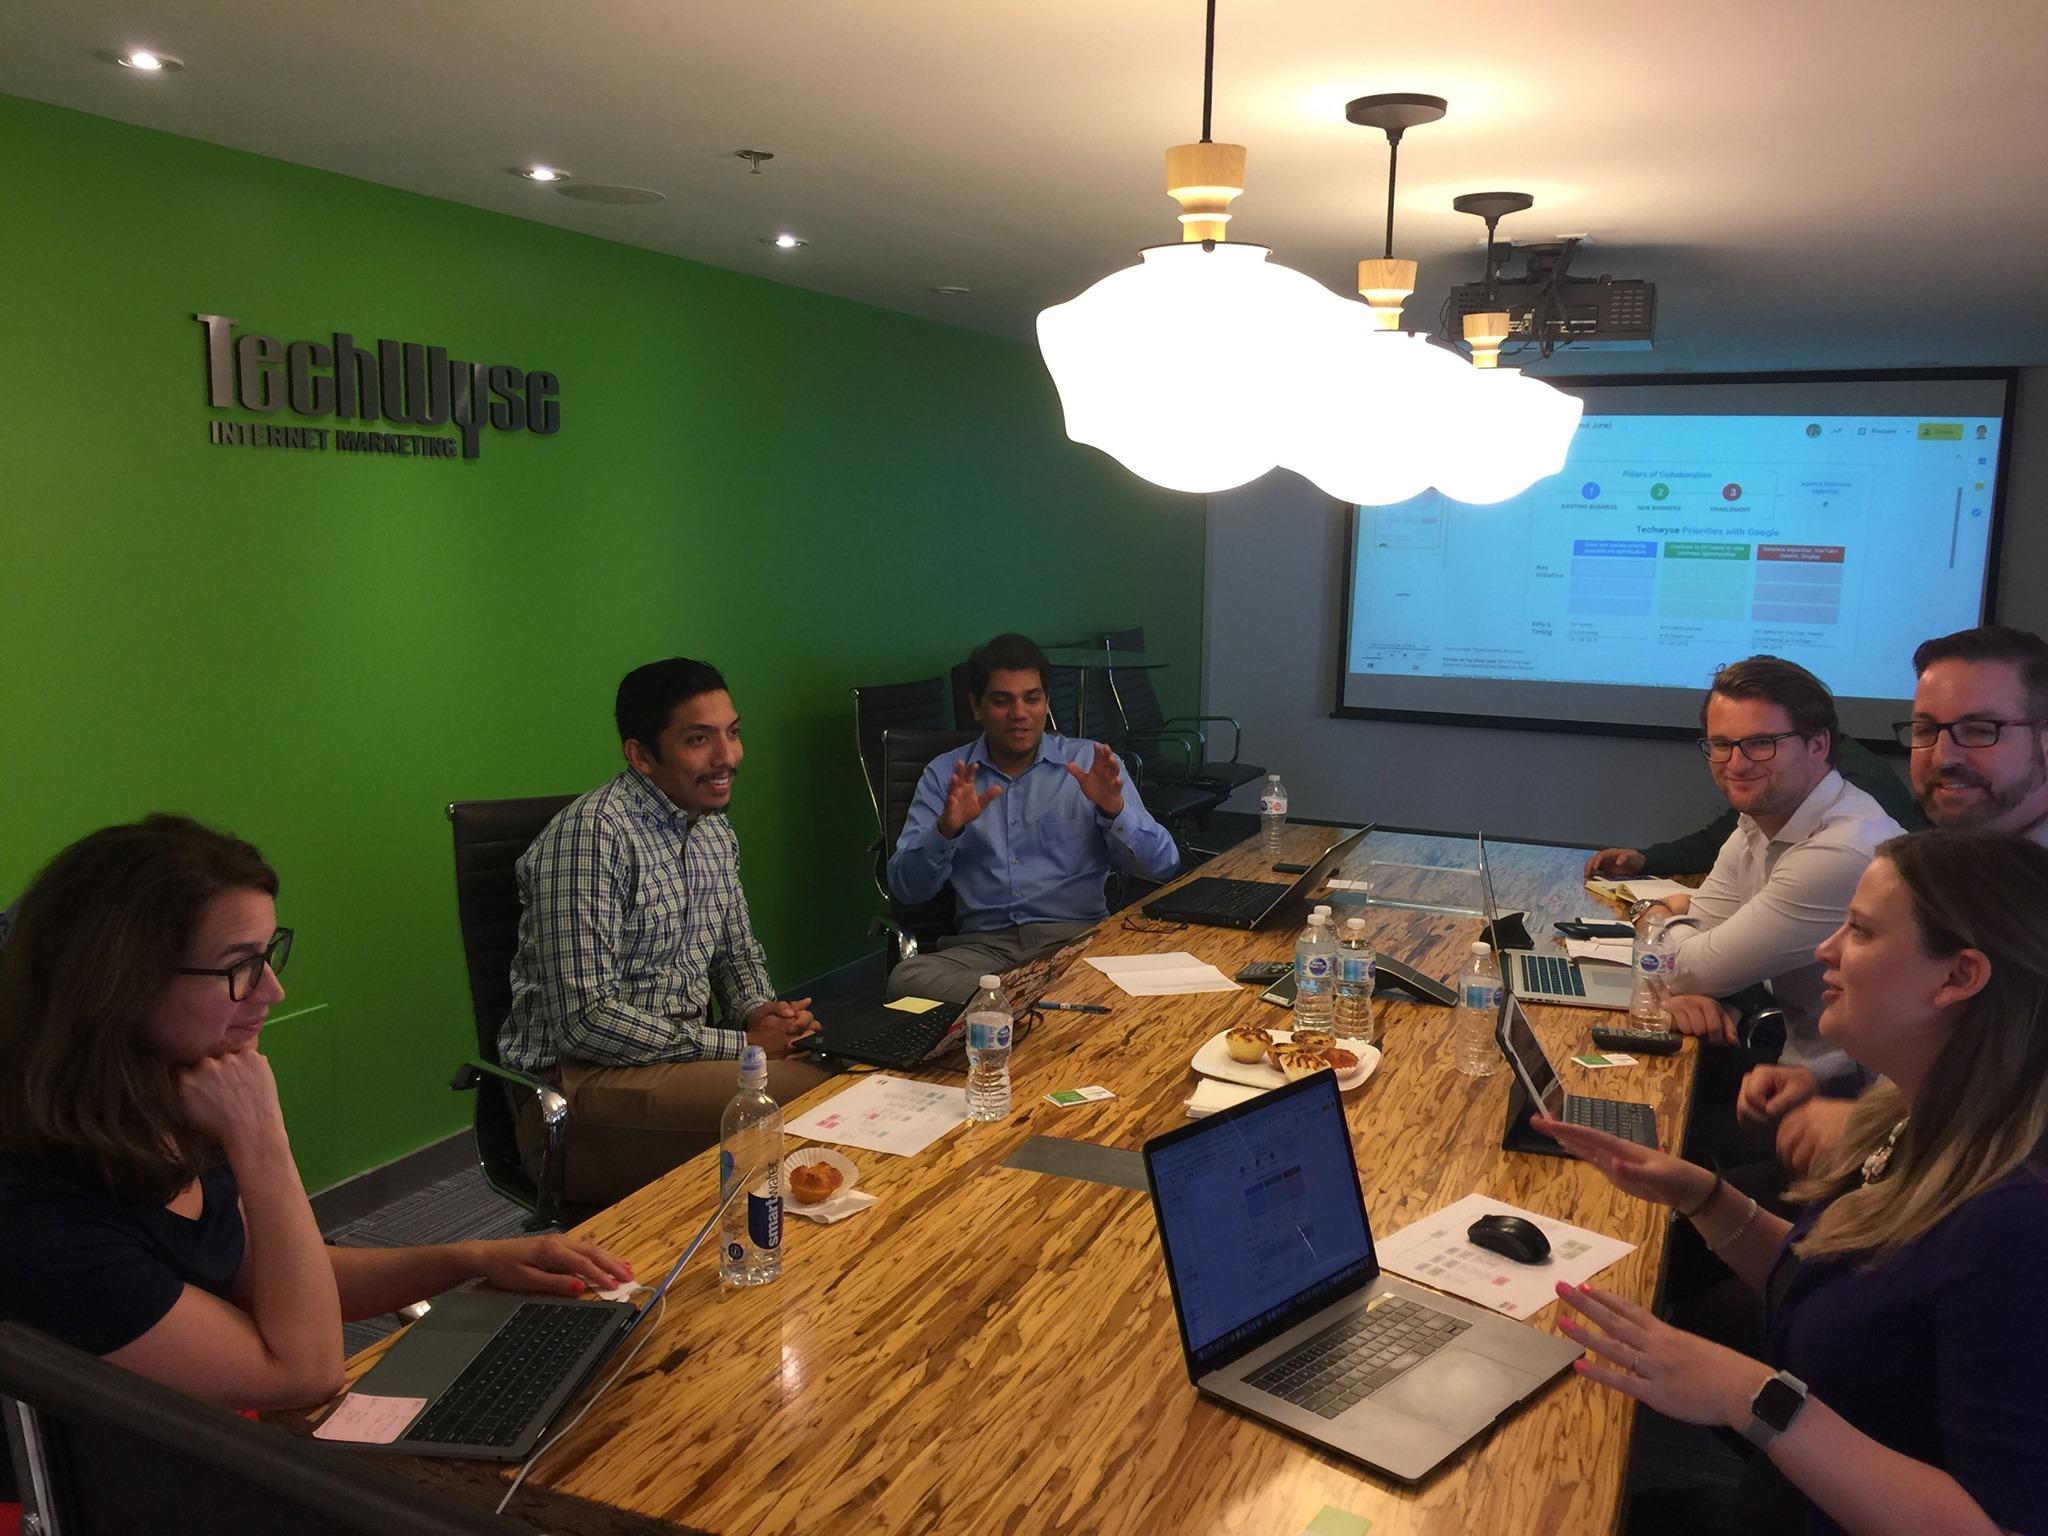 techwyse-office-meeting